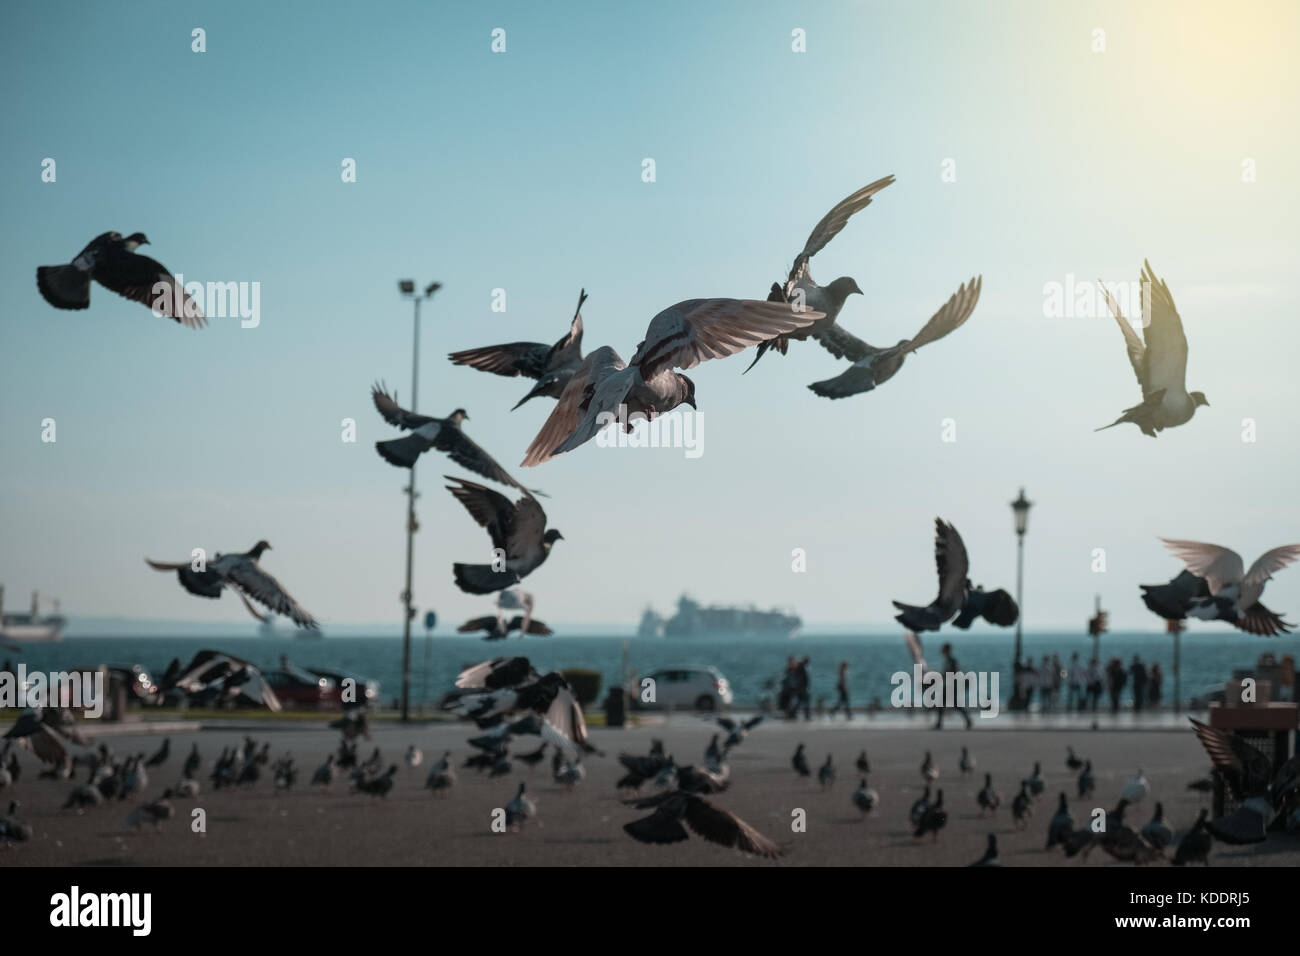 Flock of pigeons coming down on seaside park - Stock Image